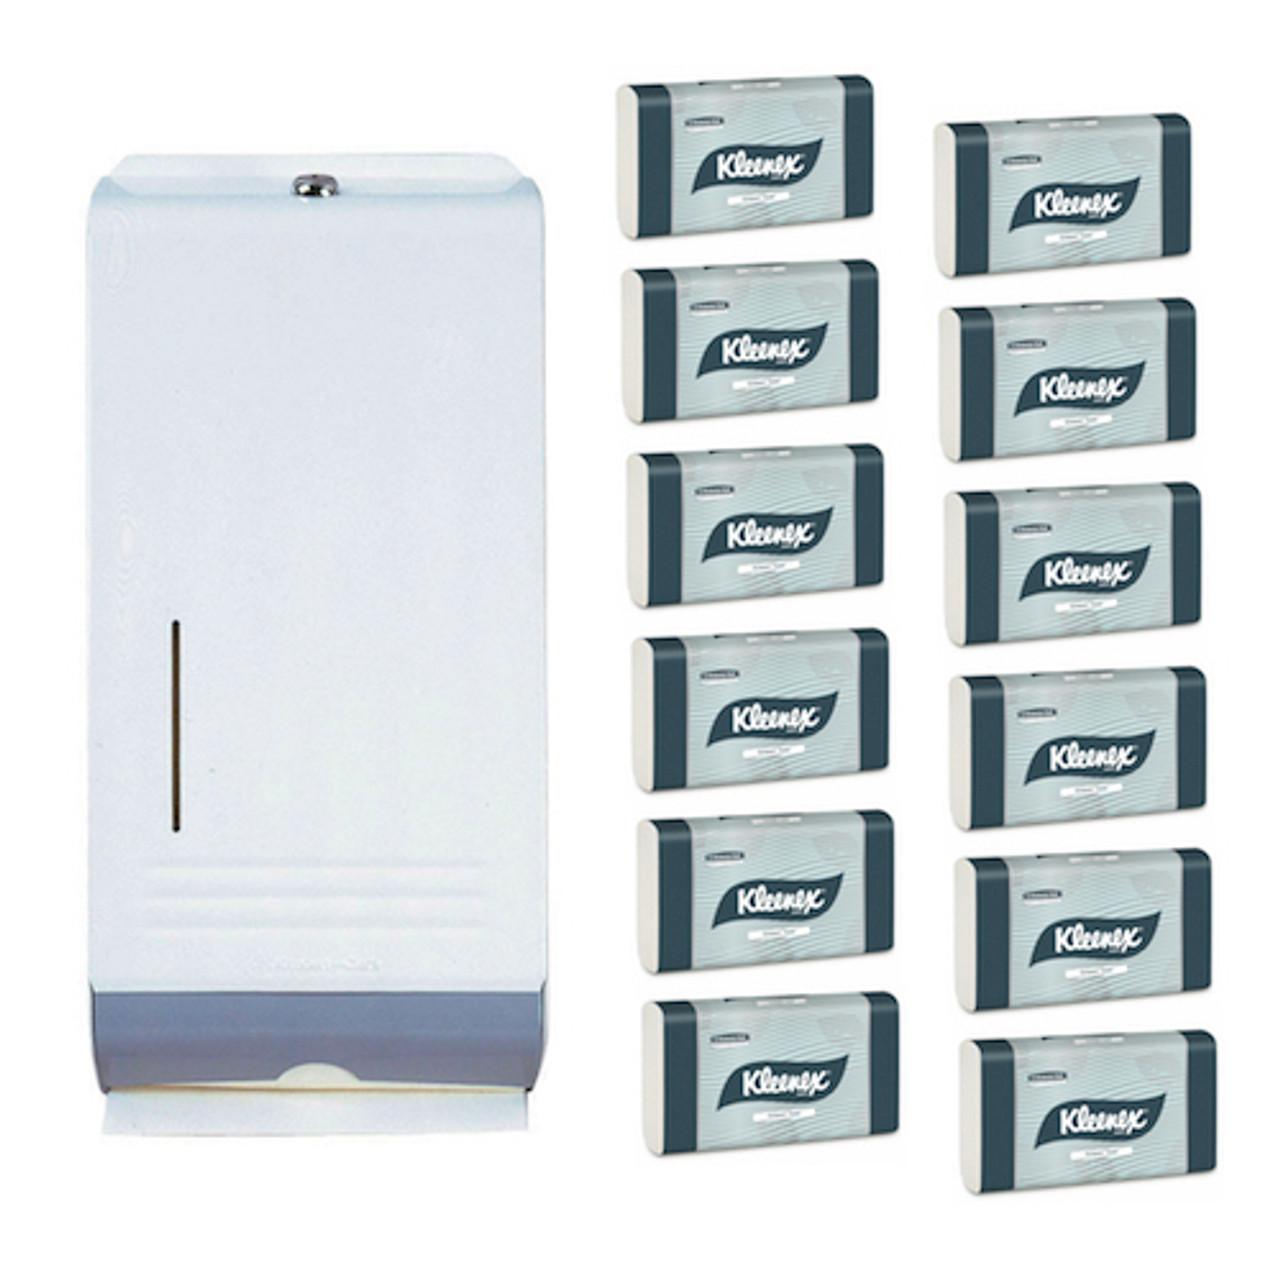 Kimberly Clark Compact Towel White Metal Starter Pack (4440 4969) Kimberly Clark Professional